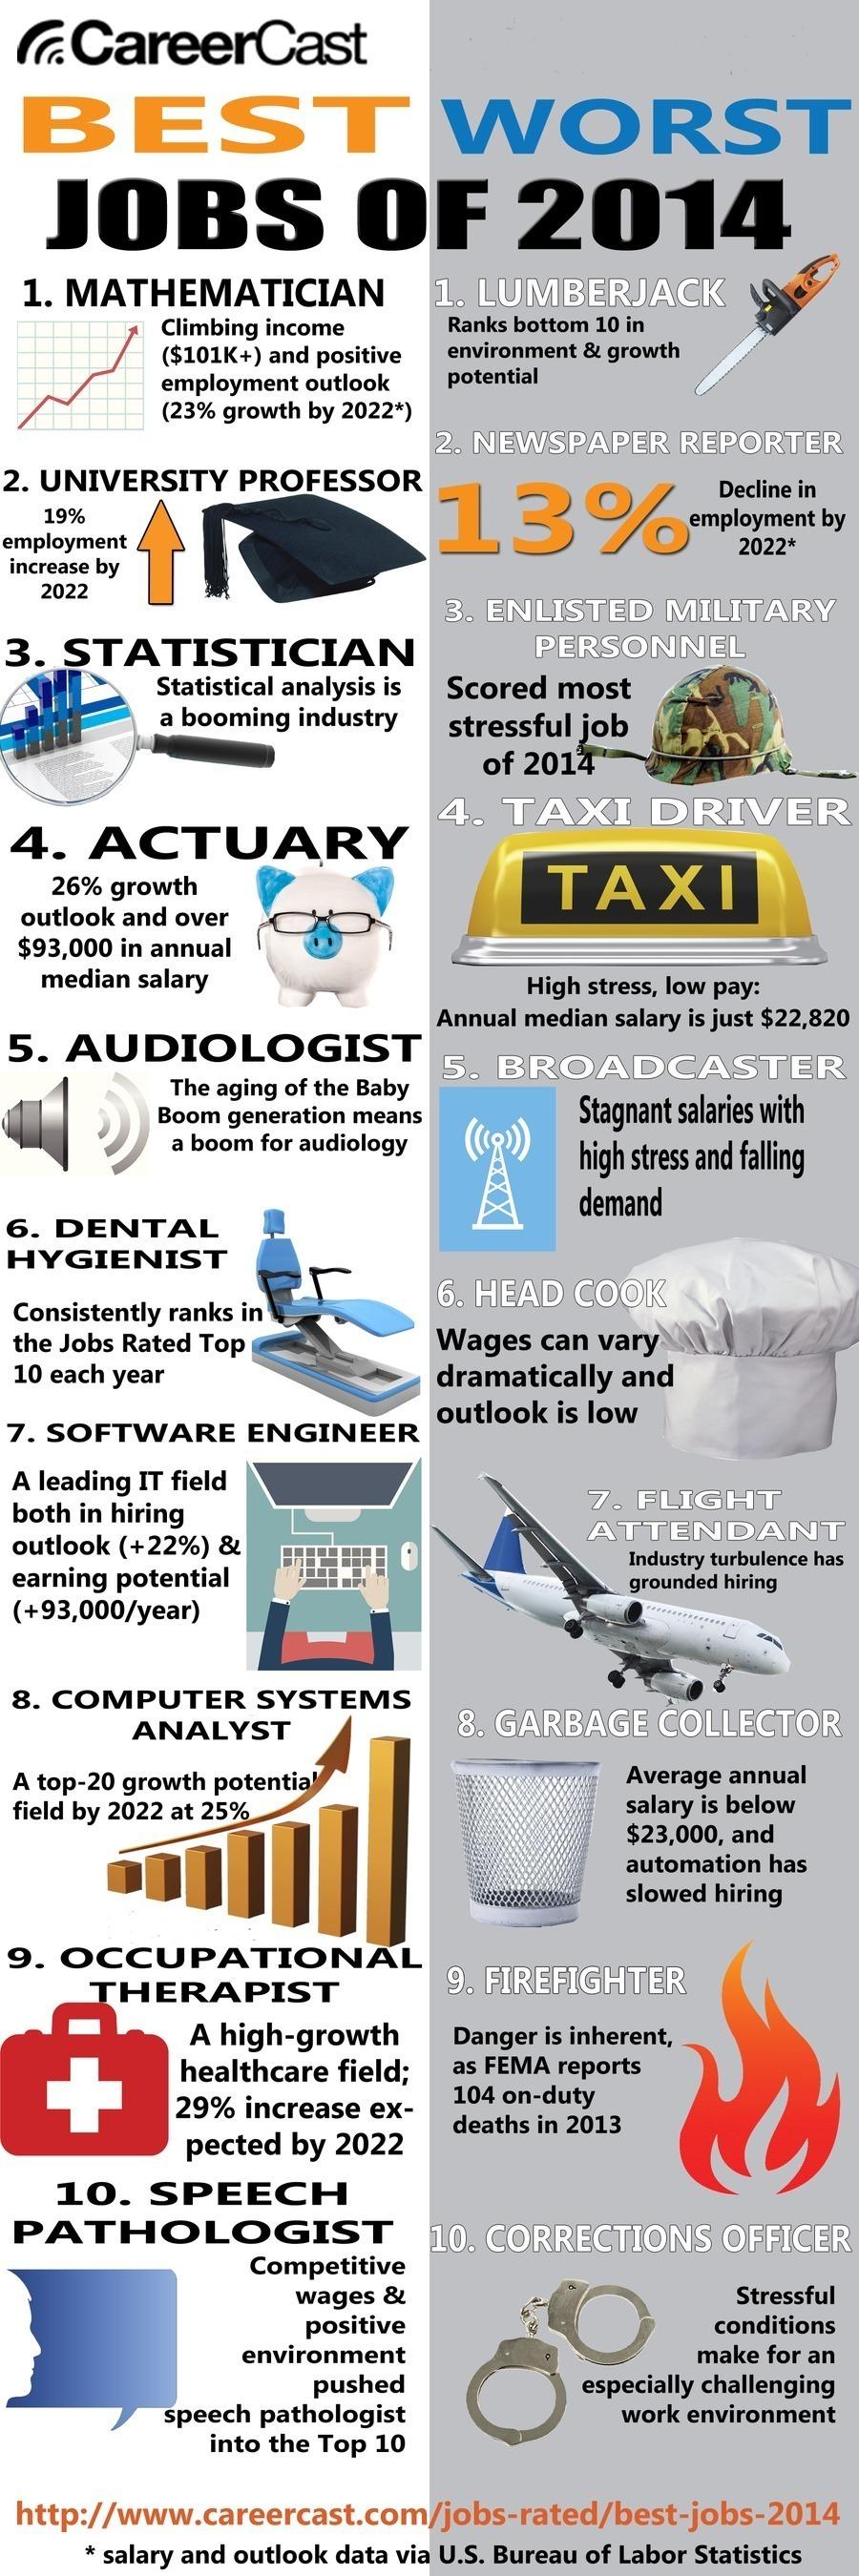 CareerCast Infographic (PRNewsFoto/CareerCast)